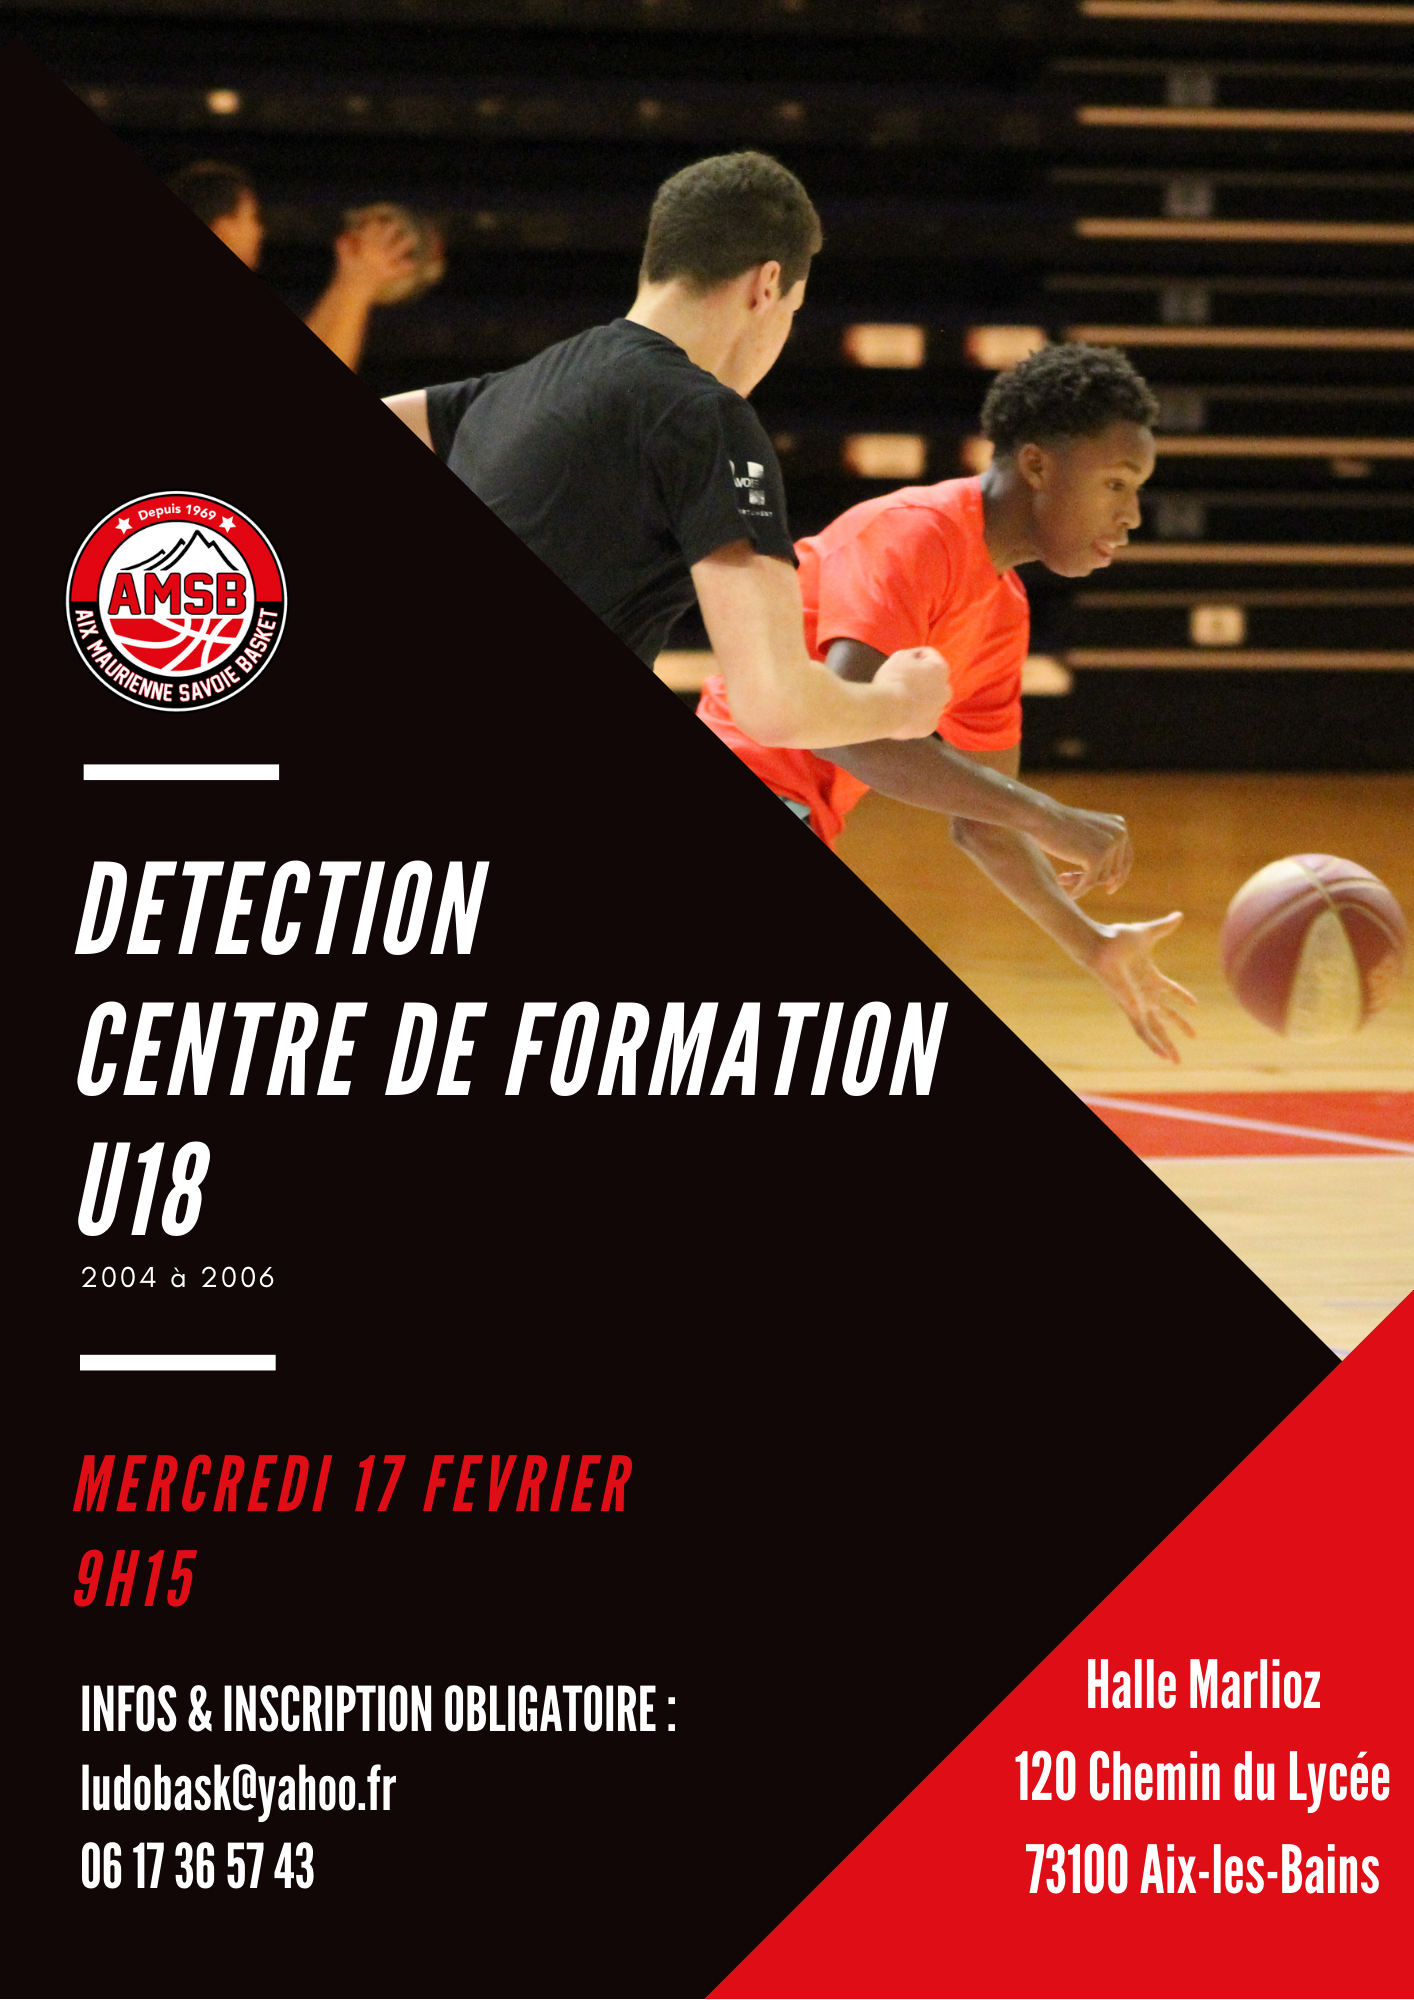 DETECTION-U18-2.png